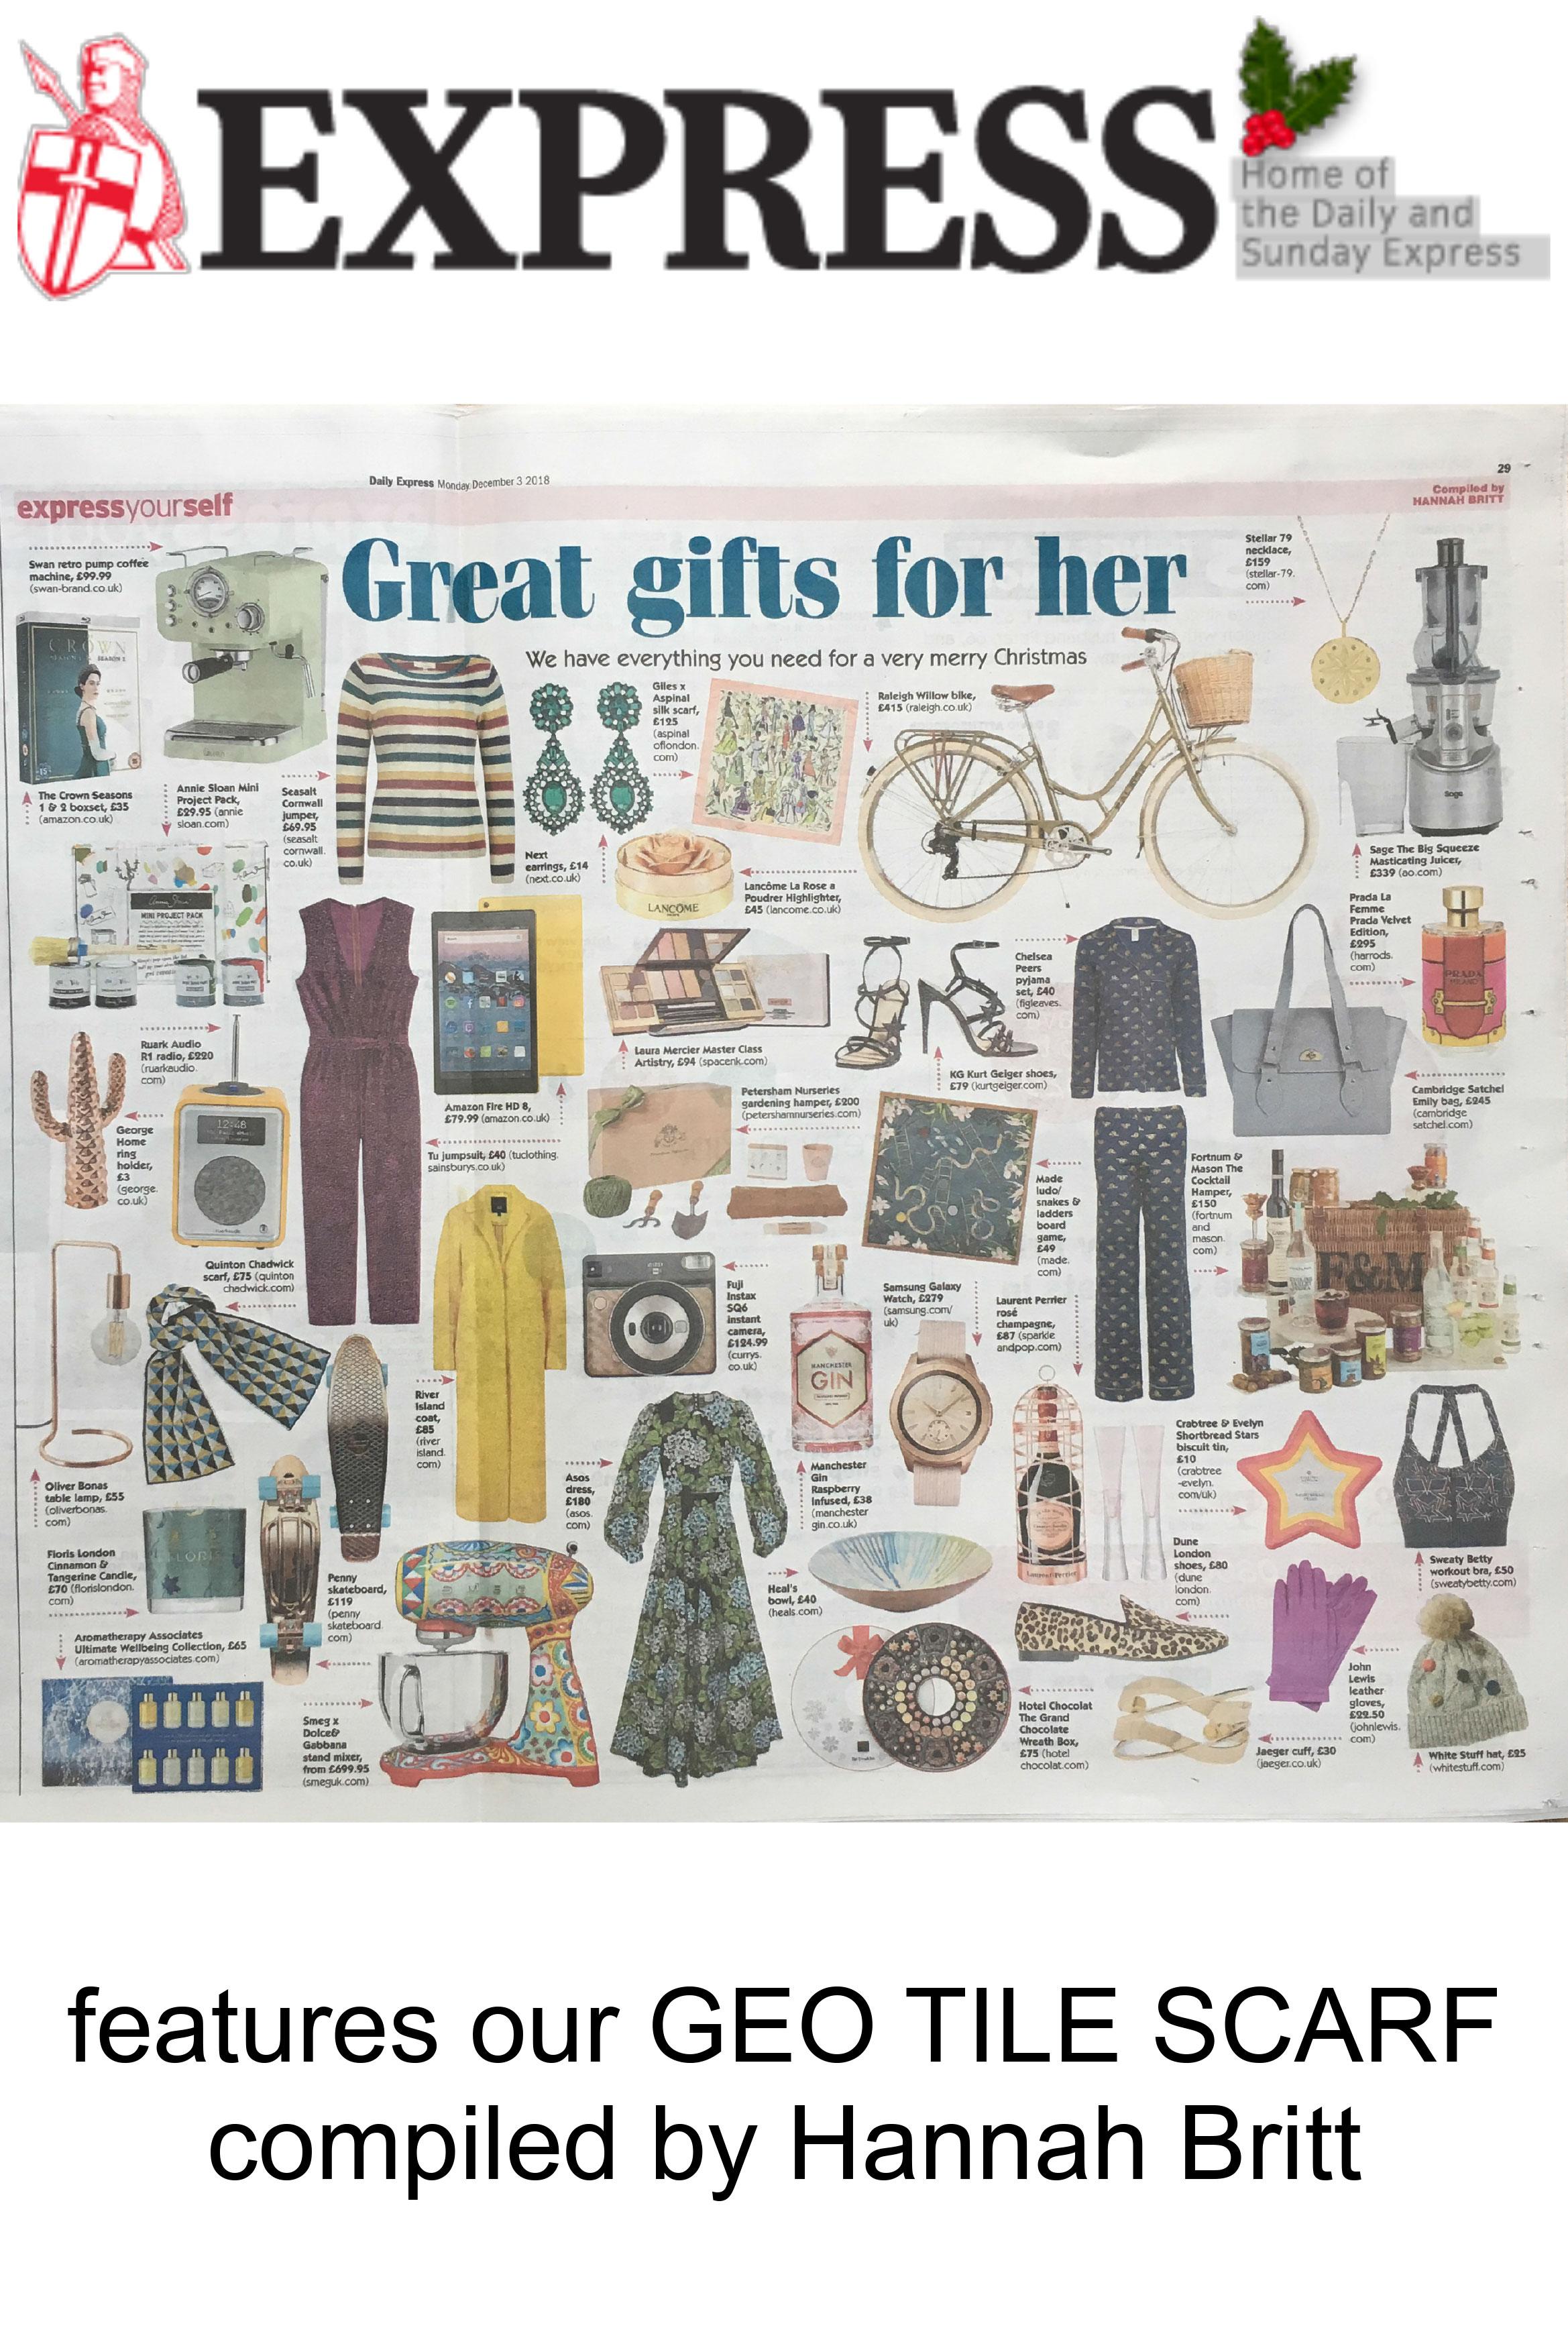 Daily Express Dec 18